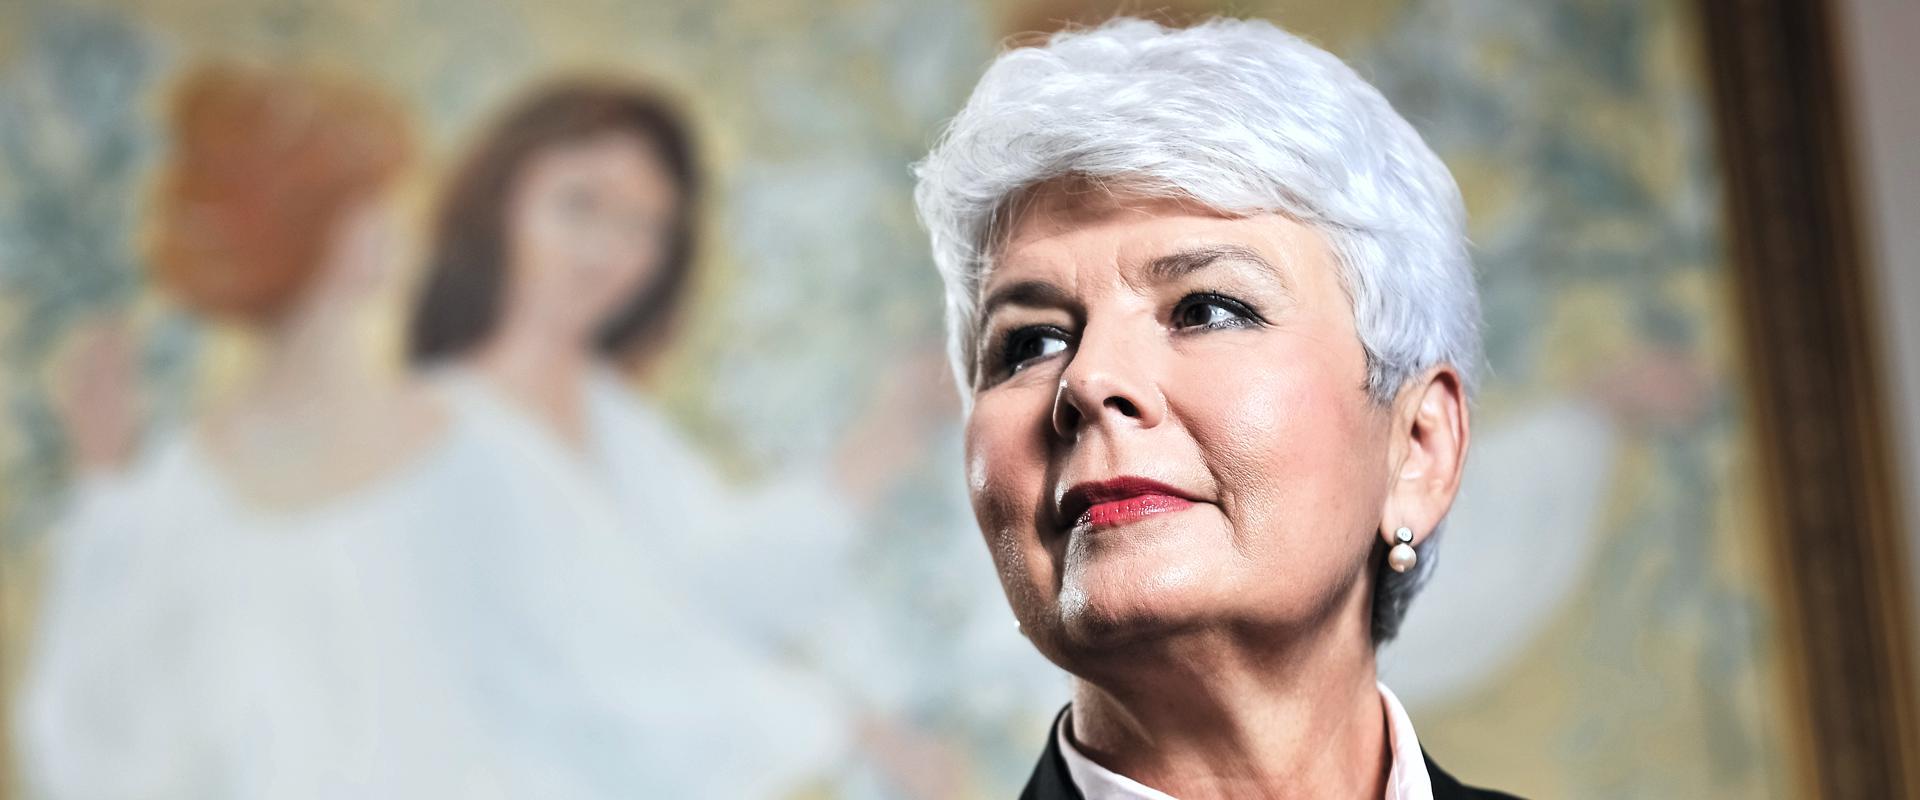 INTERVJU Jadranka Kosor:  'Ja bih odabrala hrvatskog premijera, a ne Orbána, vojvode i njihova potrčkala'